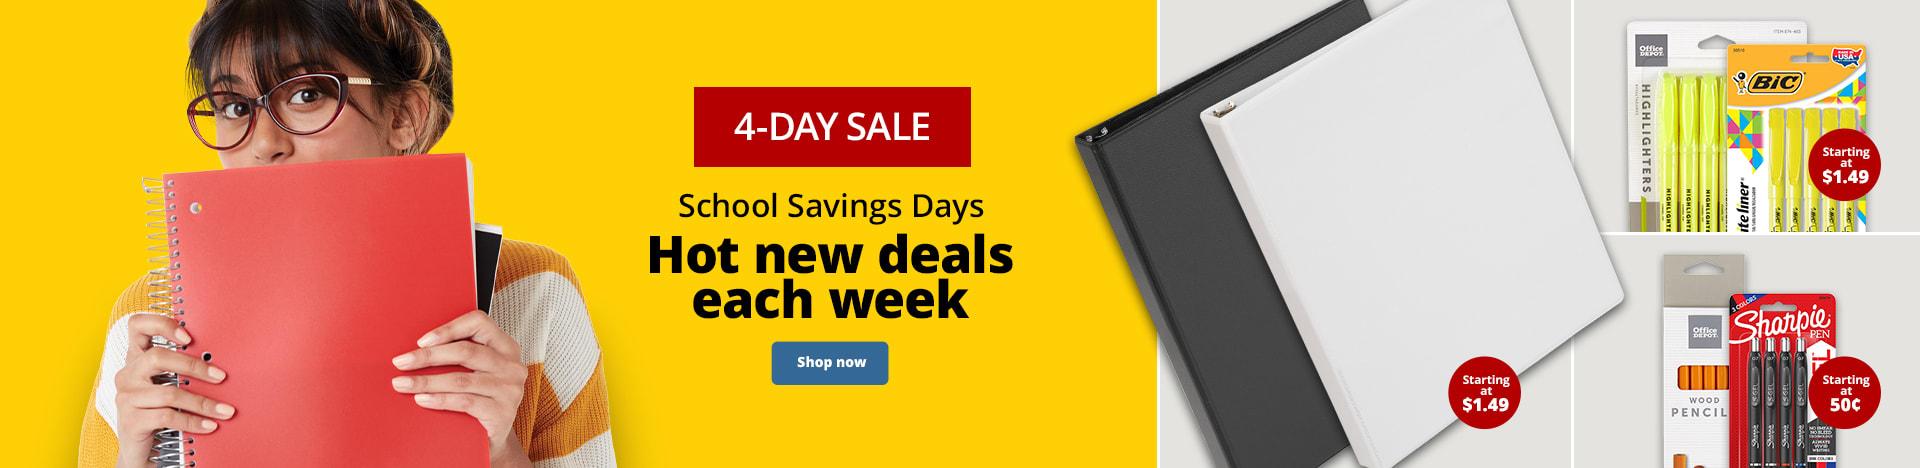 4-Day Sale. School Savings Days. Hot new deals each week